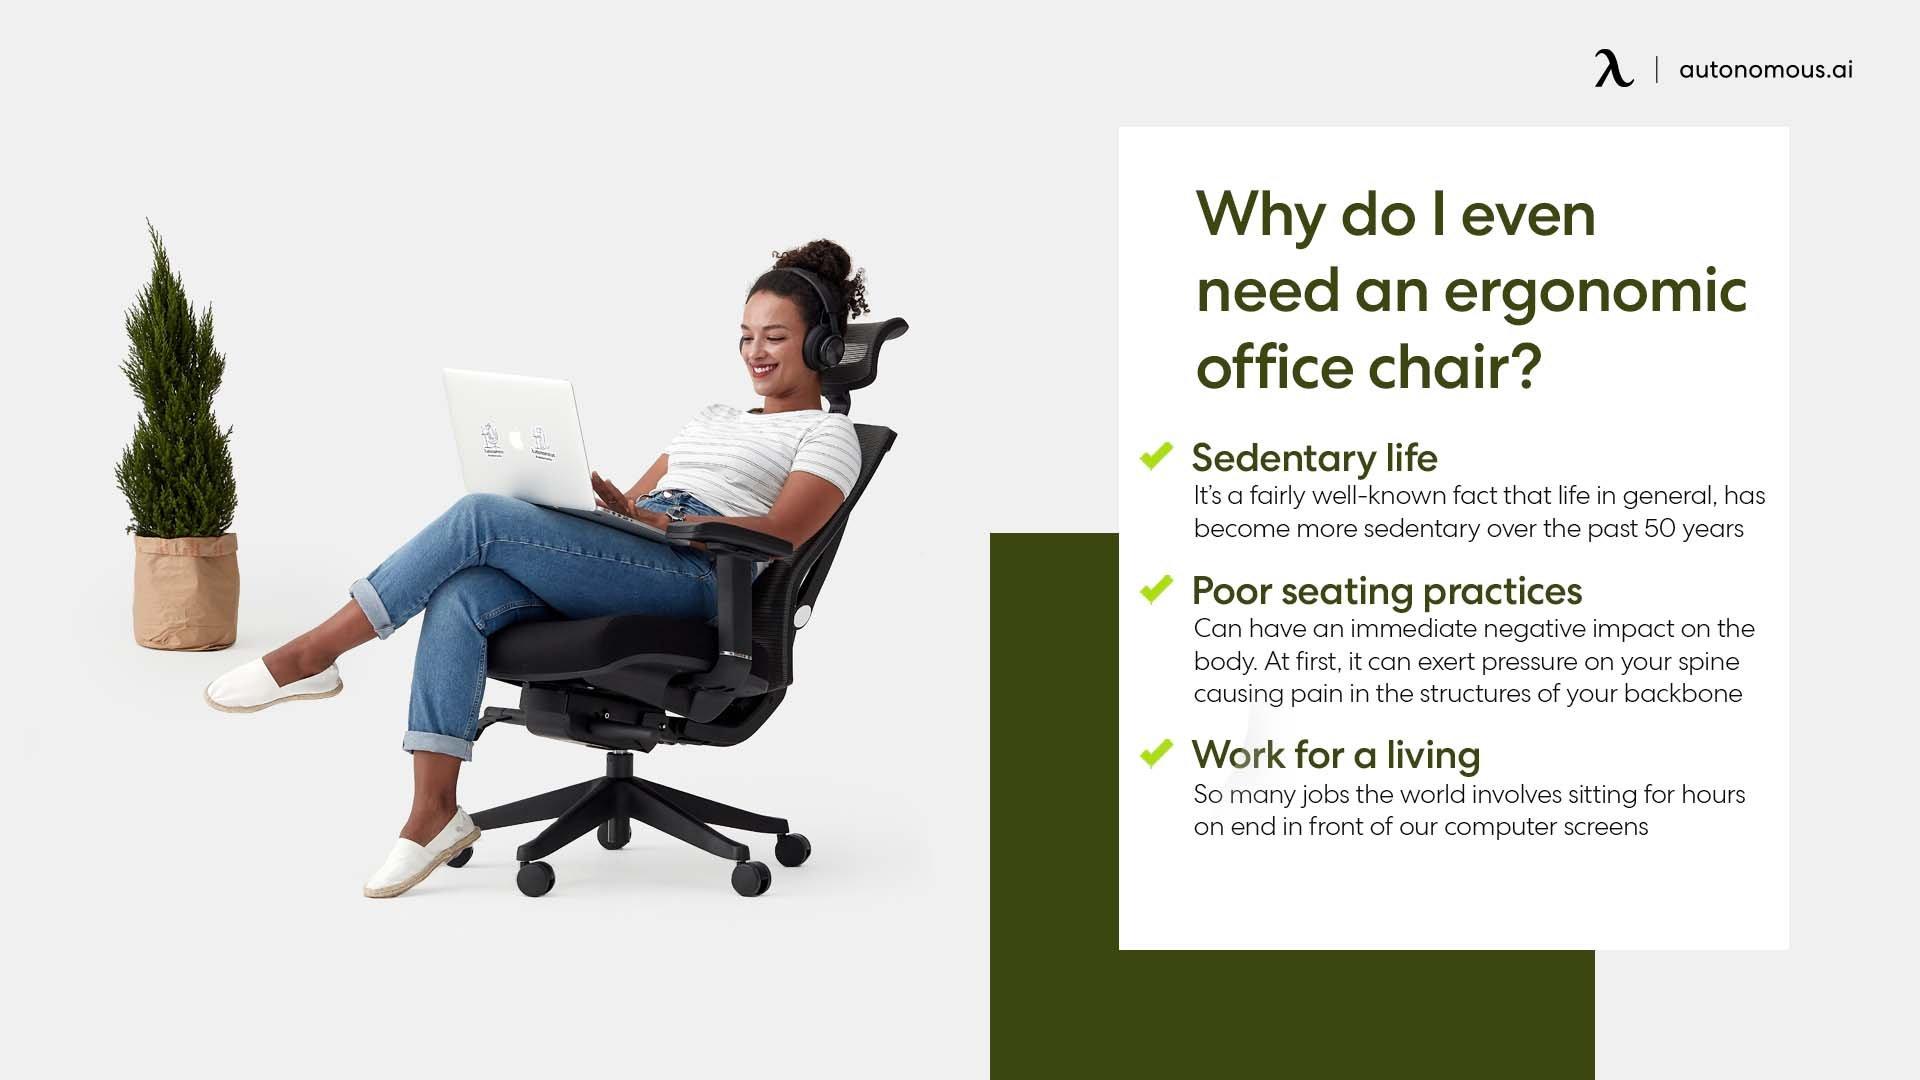 Photo of reason need an ergonomic office chair